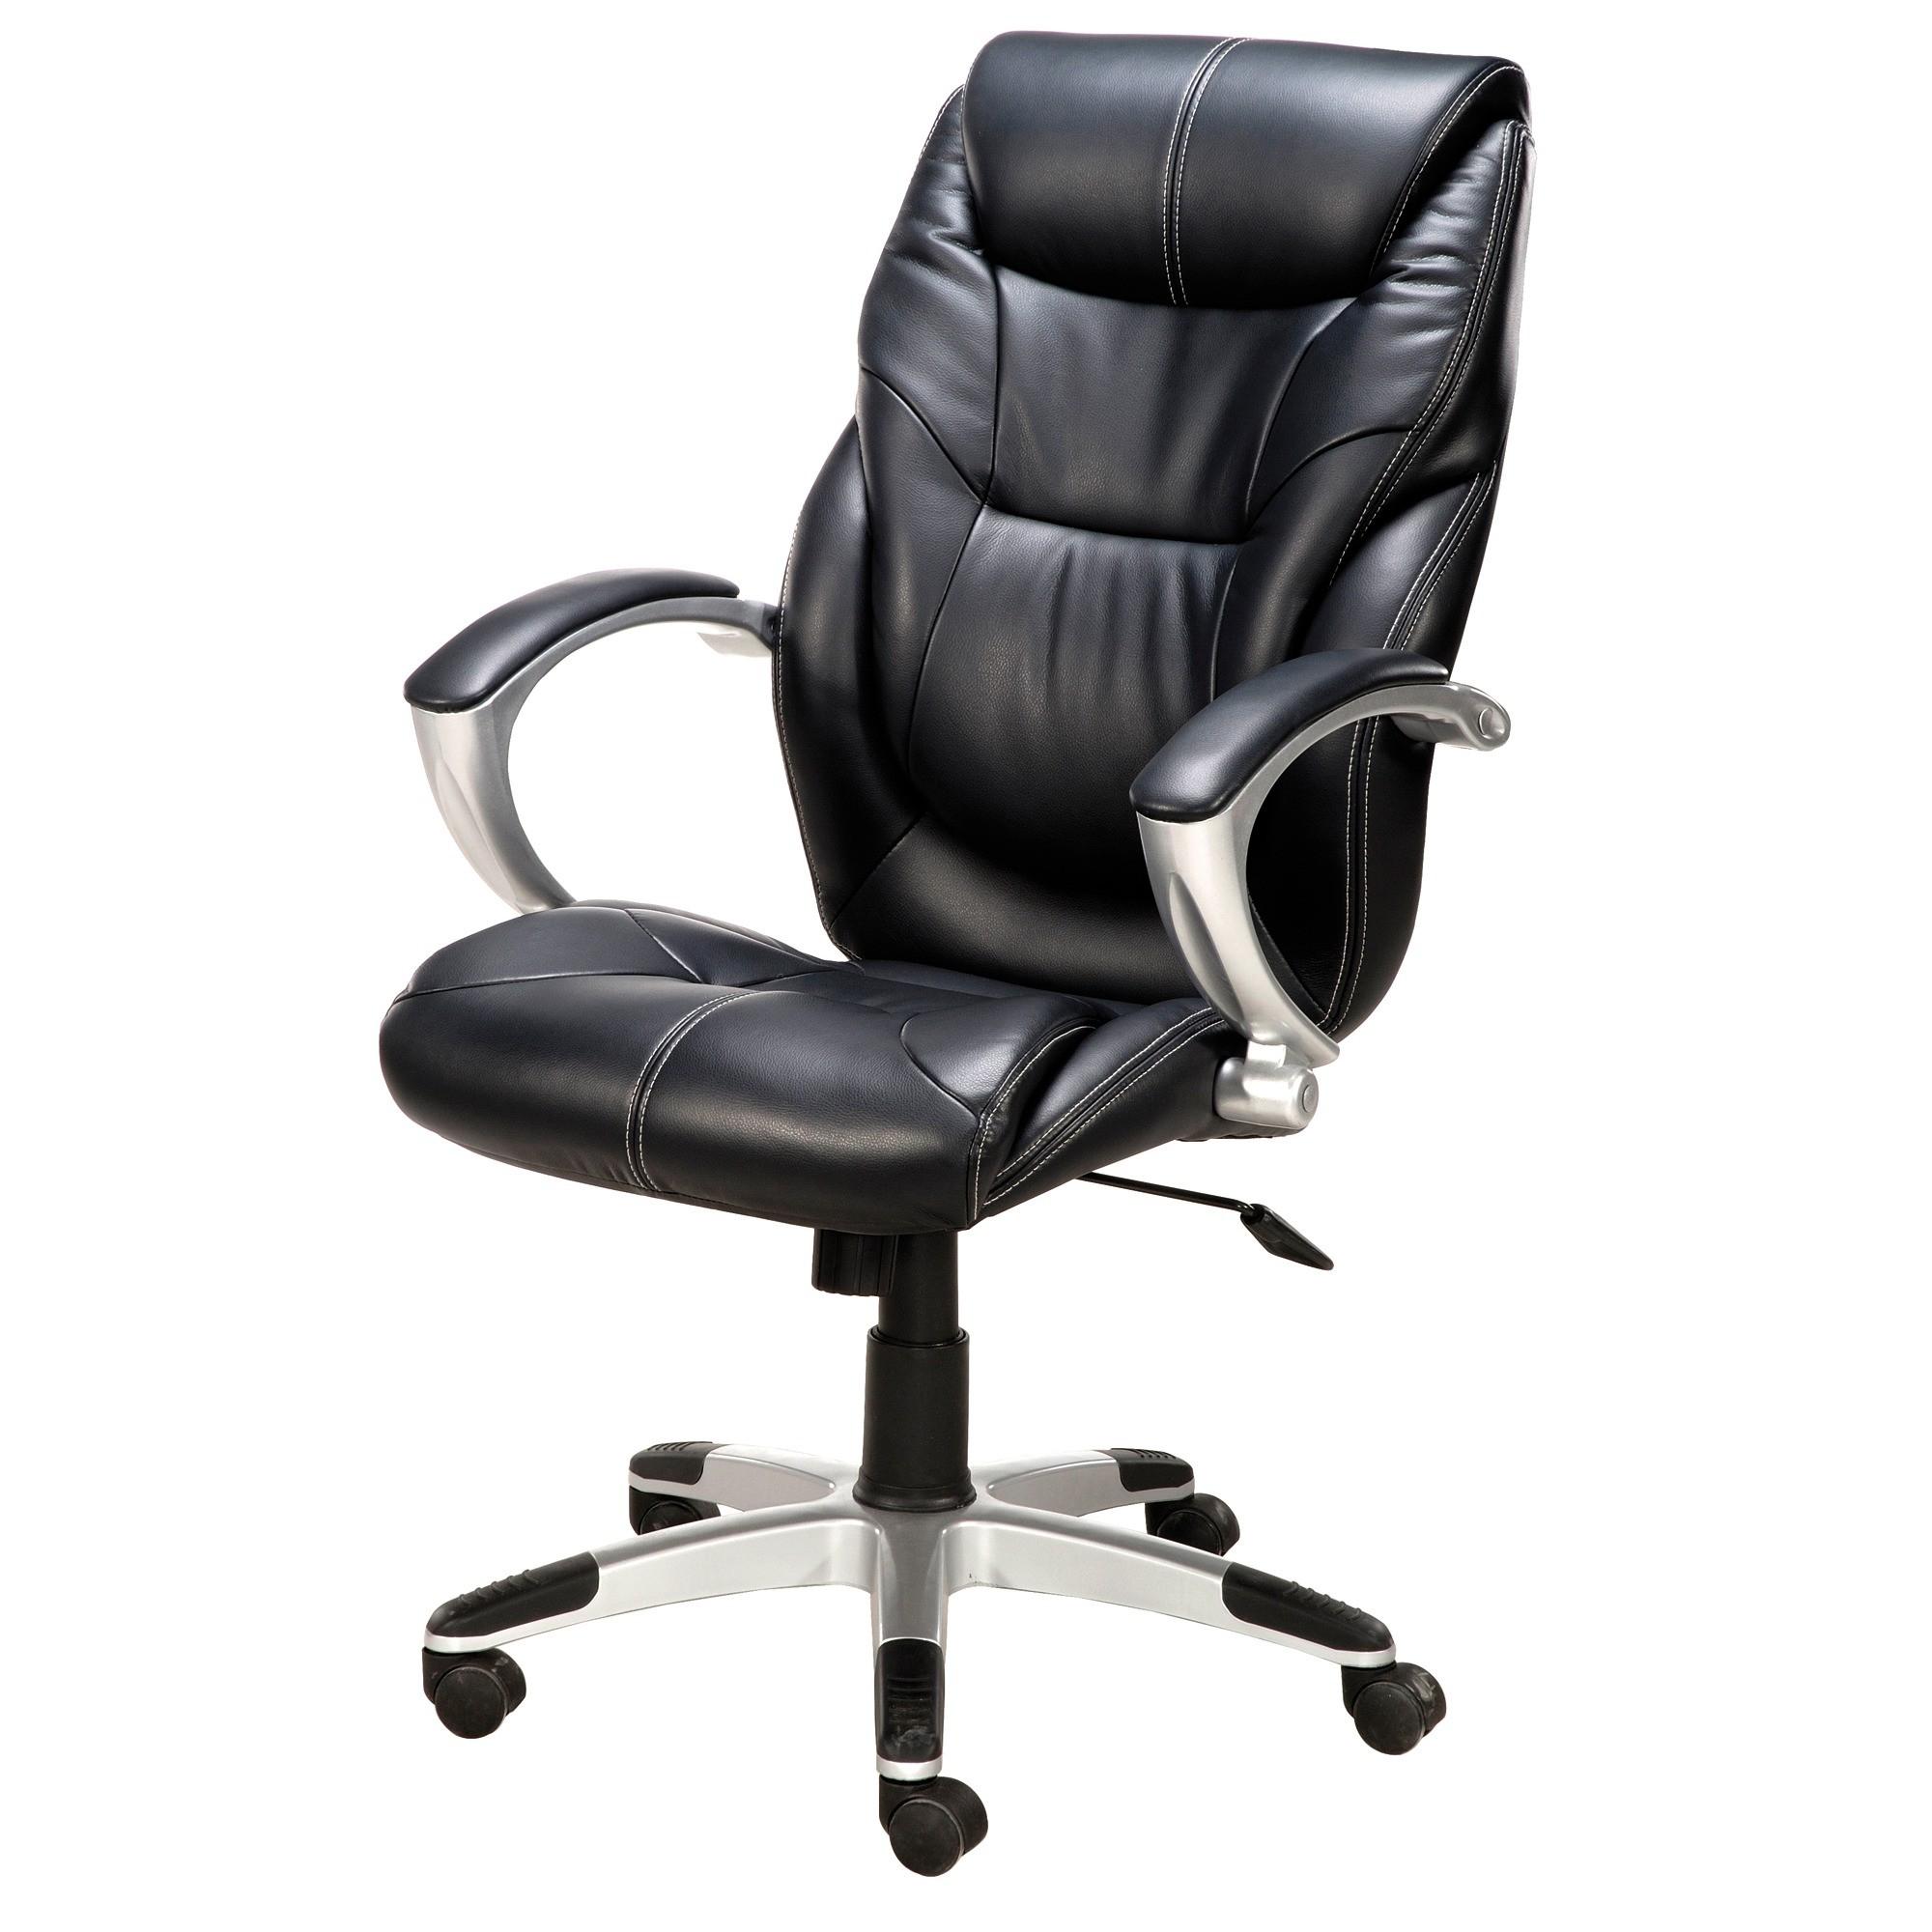 Chaise De Bureau Pas Cher Conforama